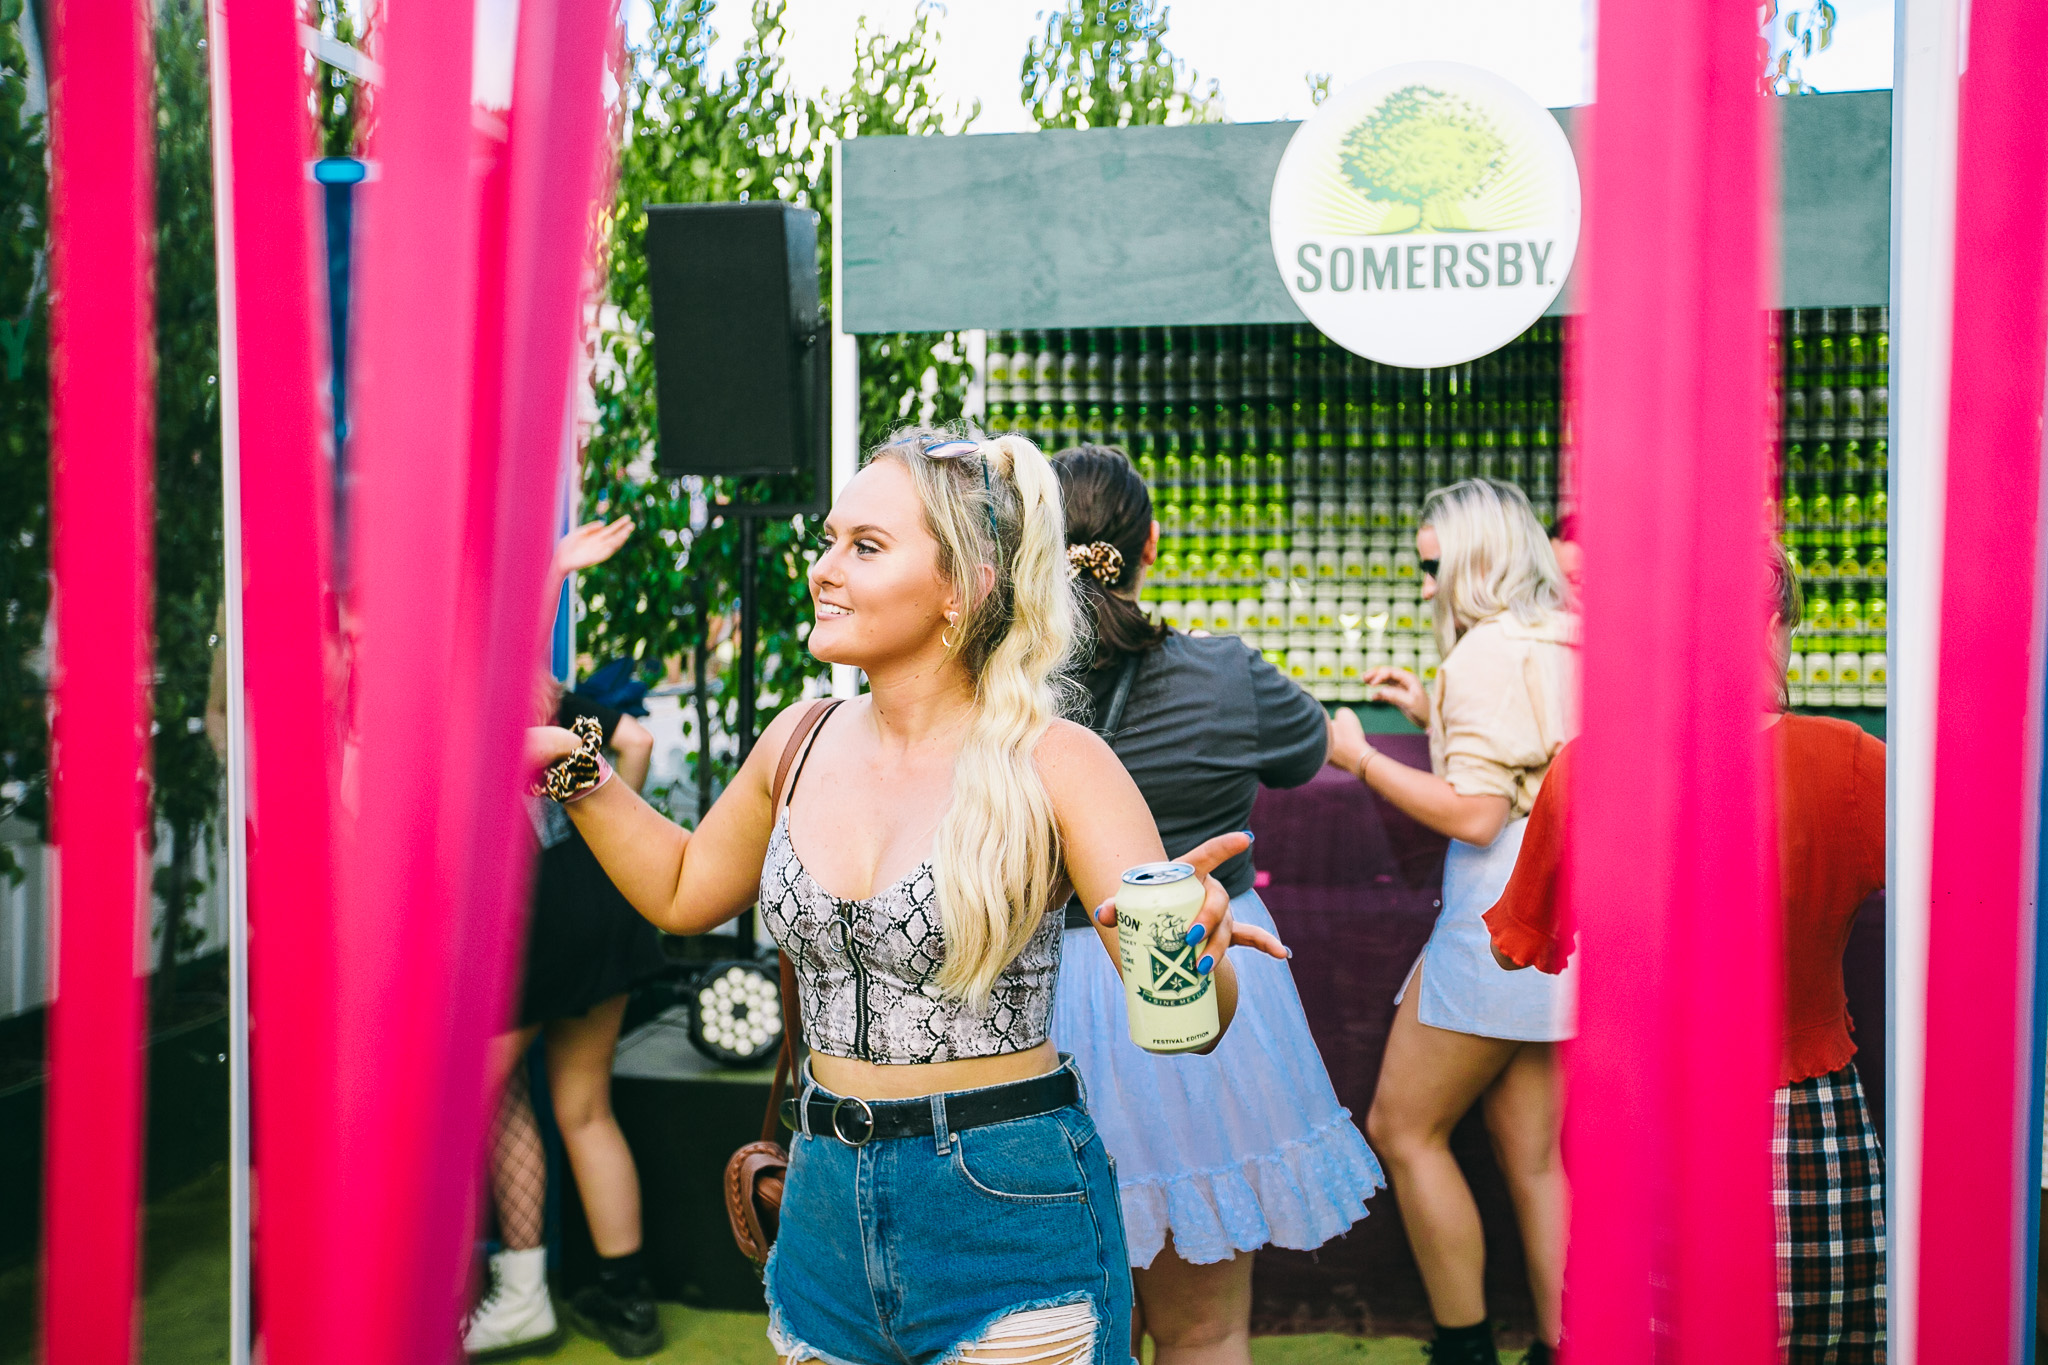 Sponsors - Somersby_Laneway Brisbane 2019_Bianca Holderness-3.jpg